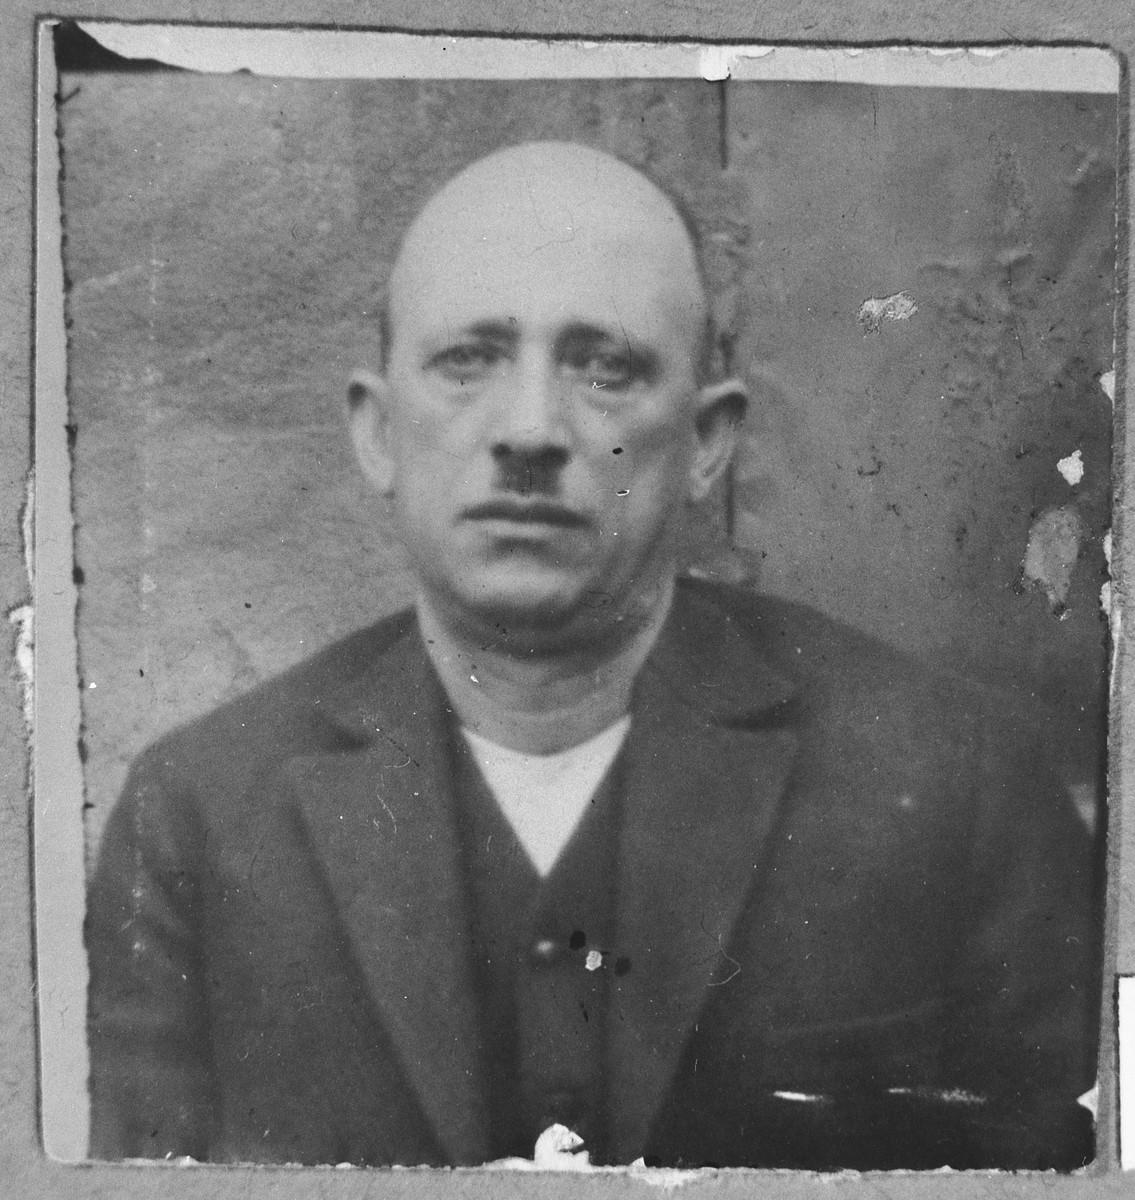 Portrait of Yakov Albala.